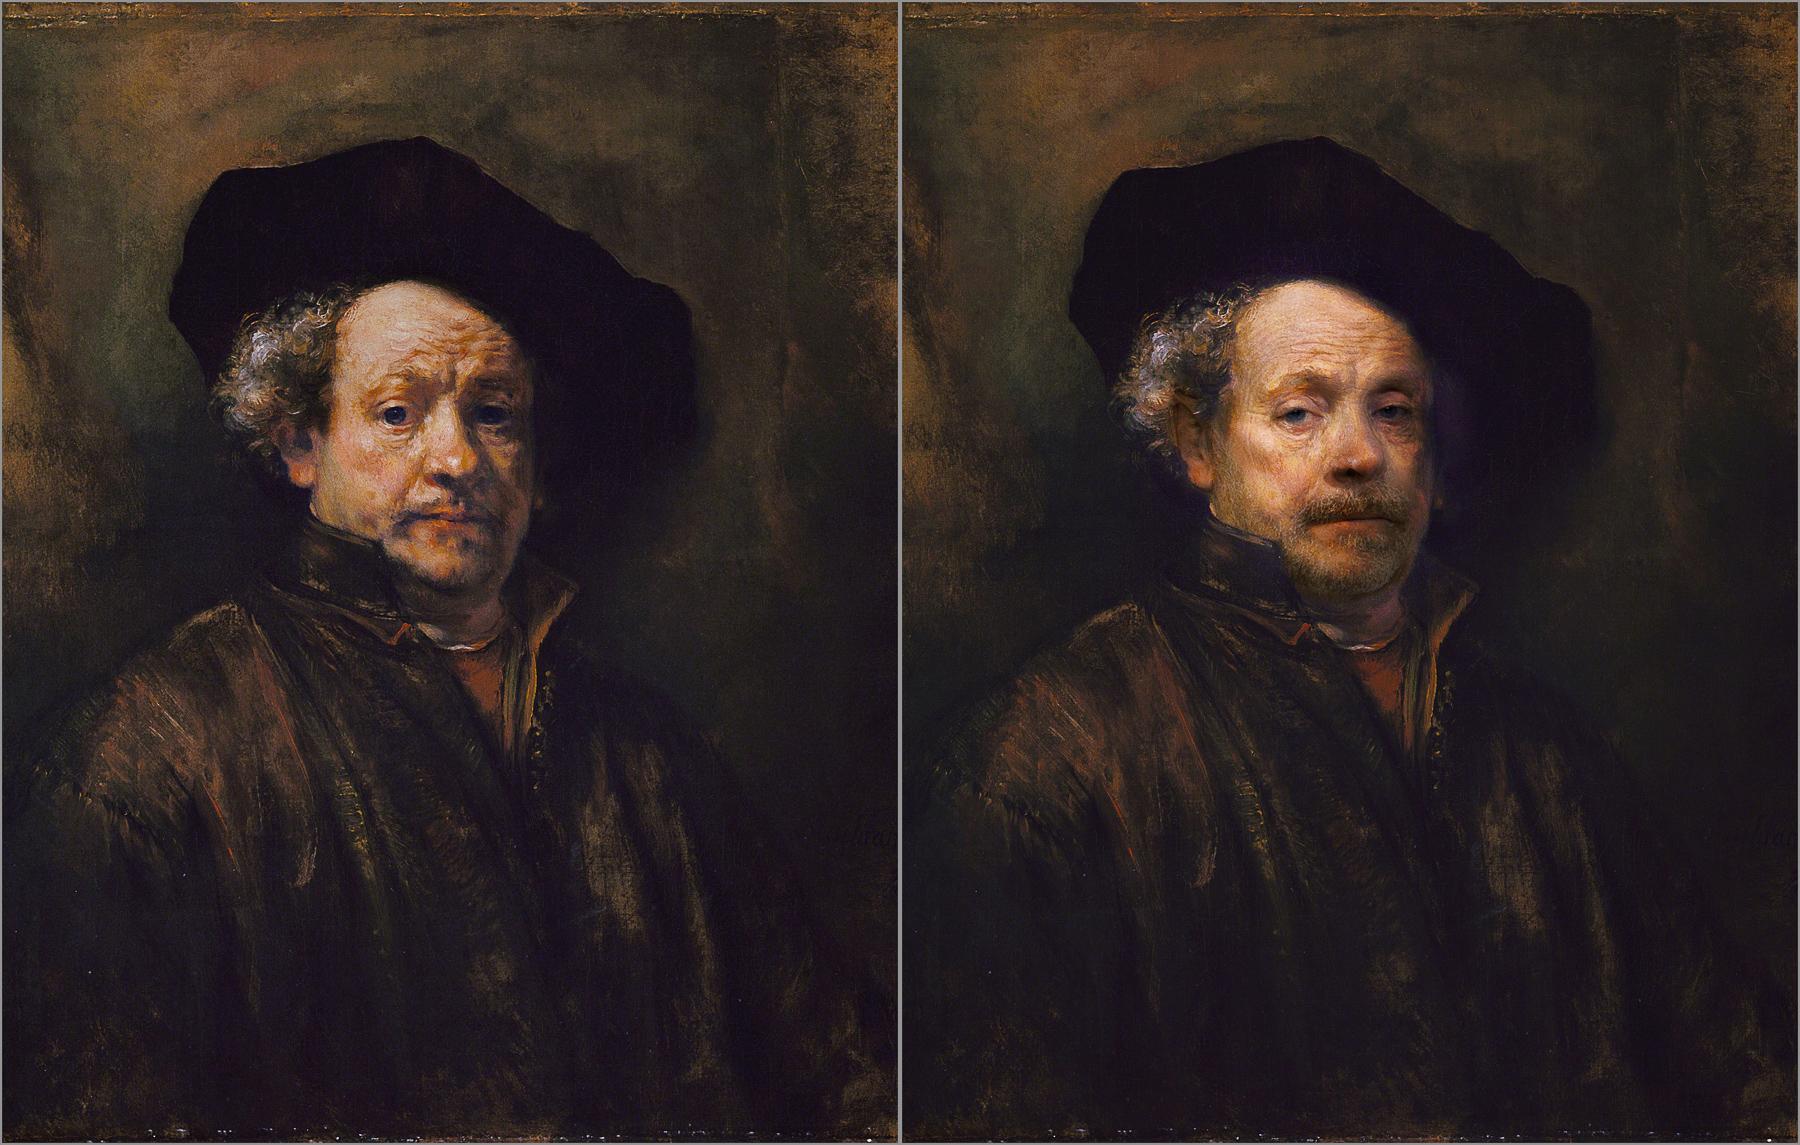 Rembrandt van Rijn, Self Portrait, 1660, Chris Golson.